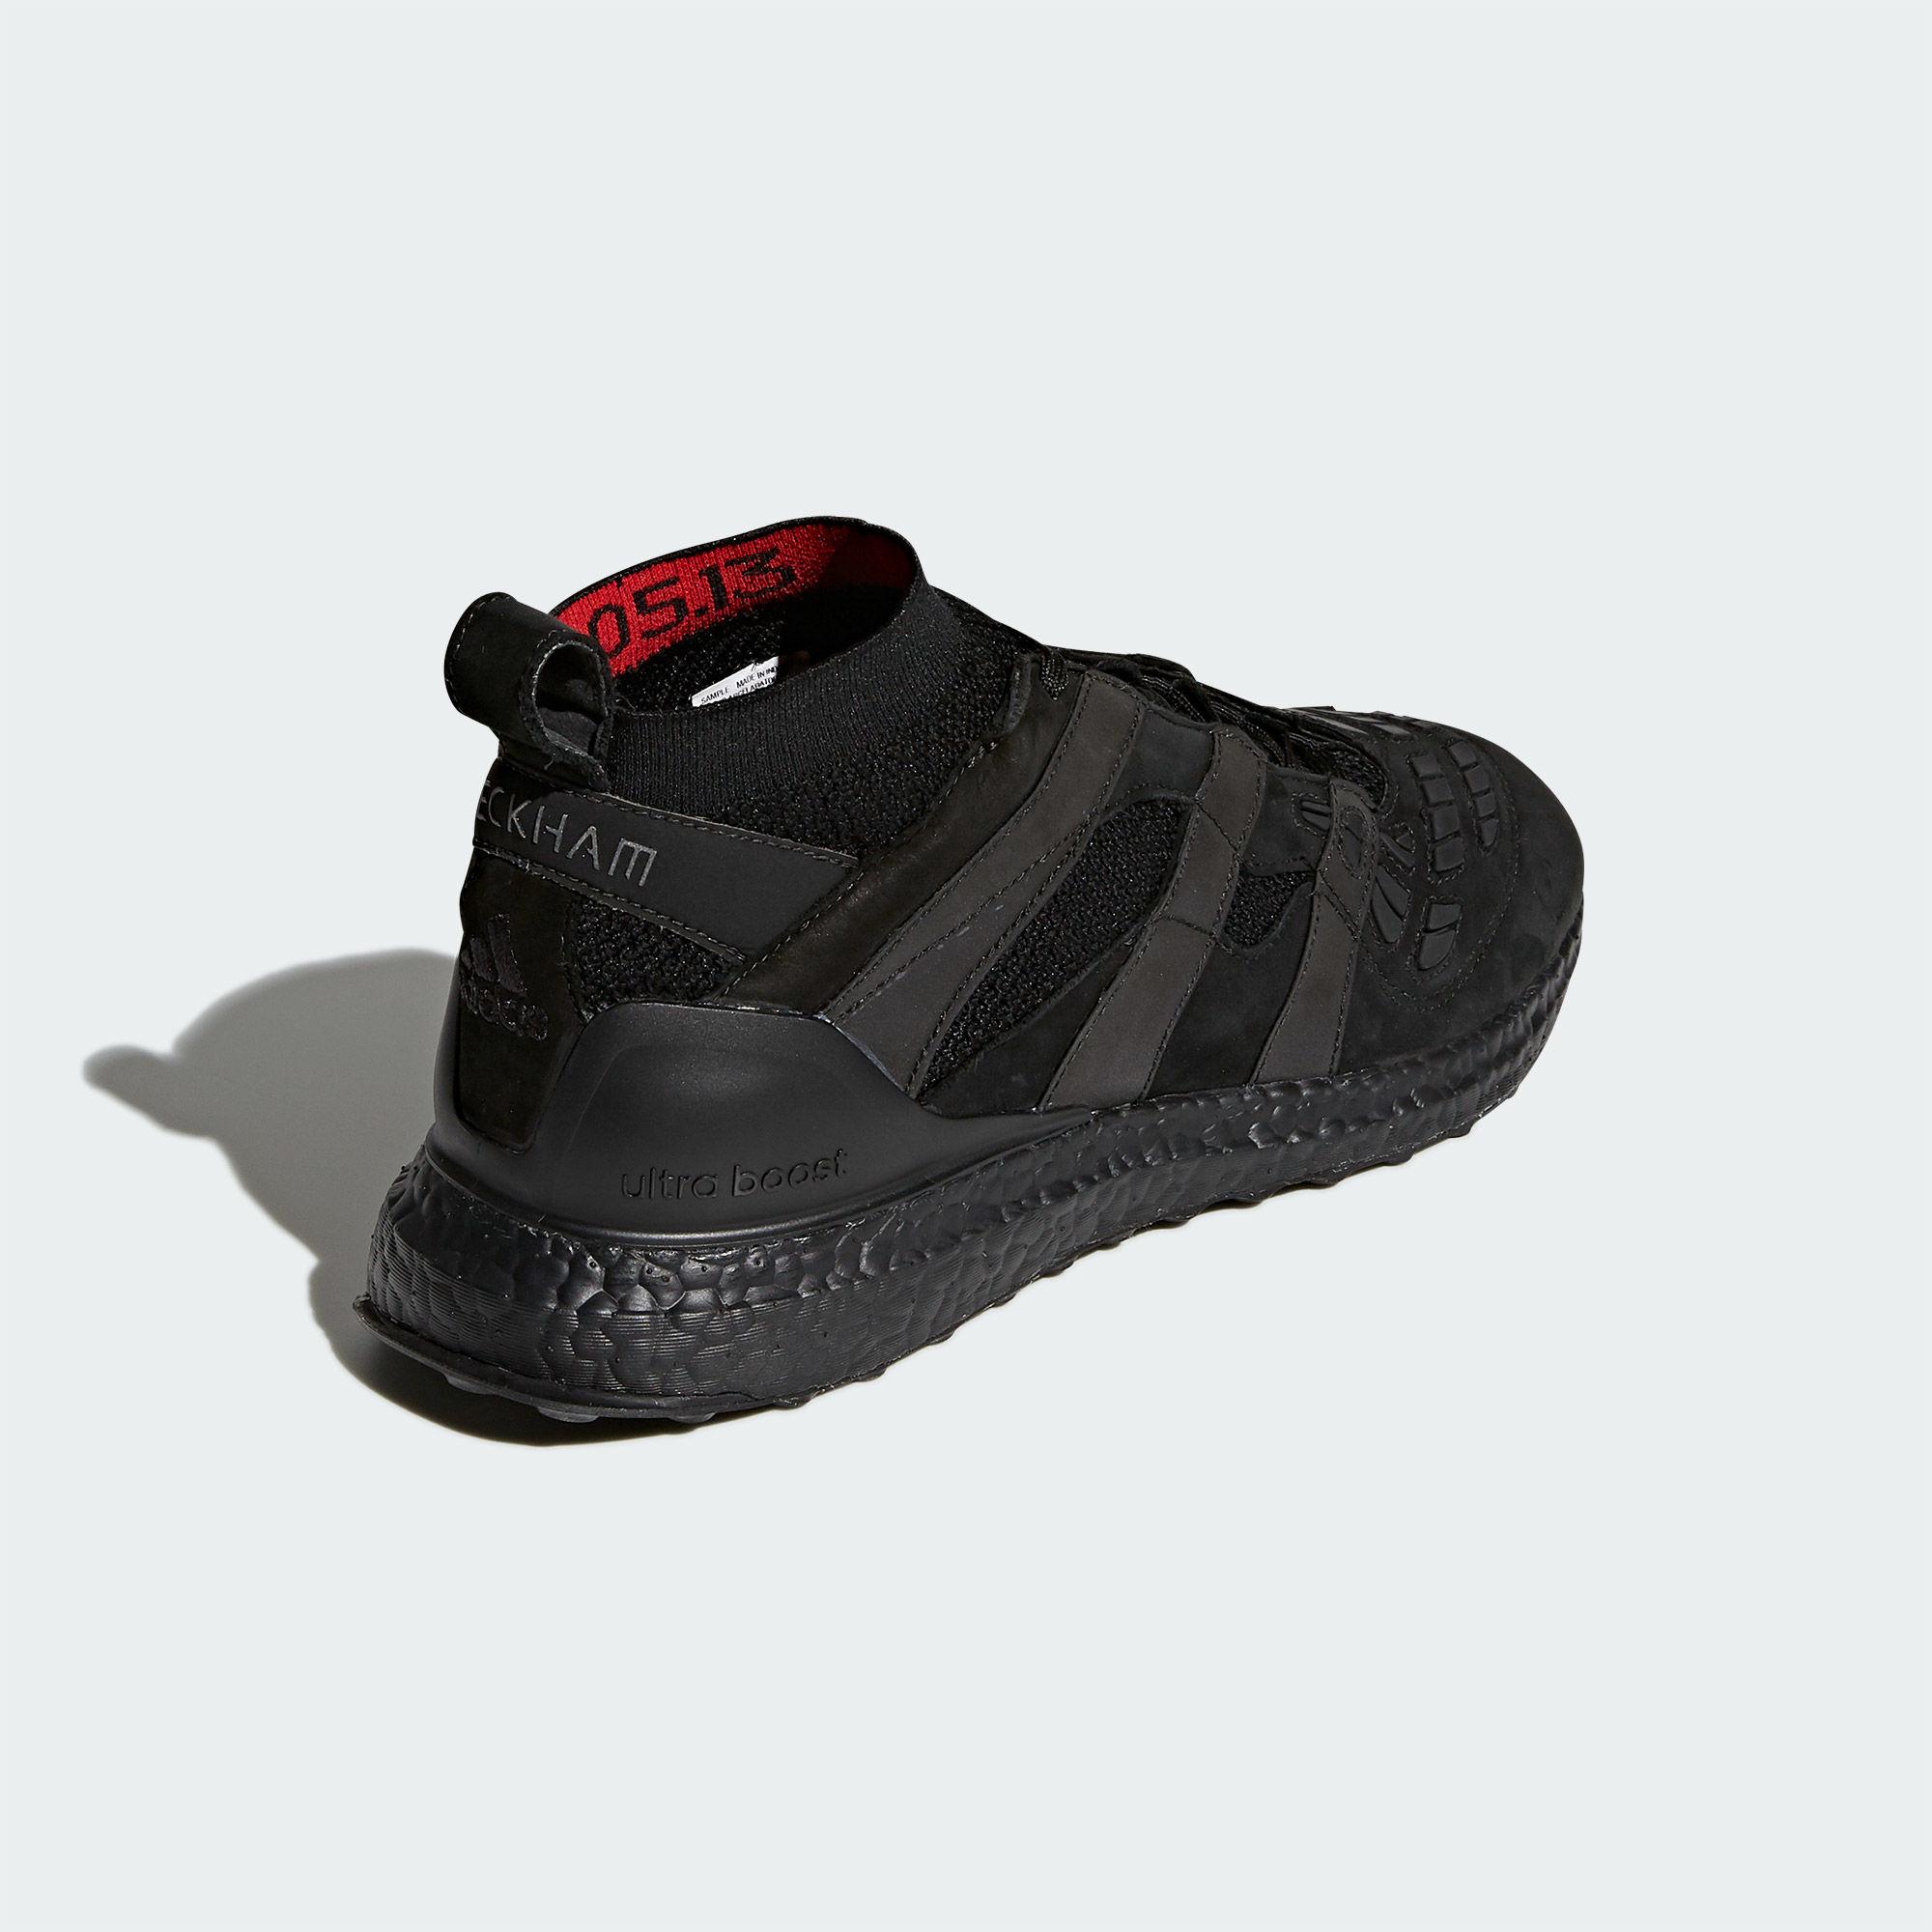 adidas david beckham accelerator ultraboost shoes core